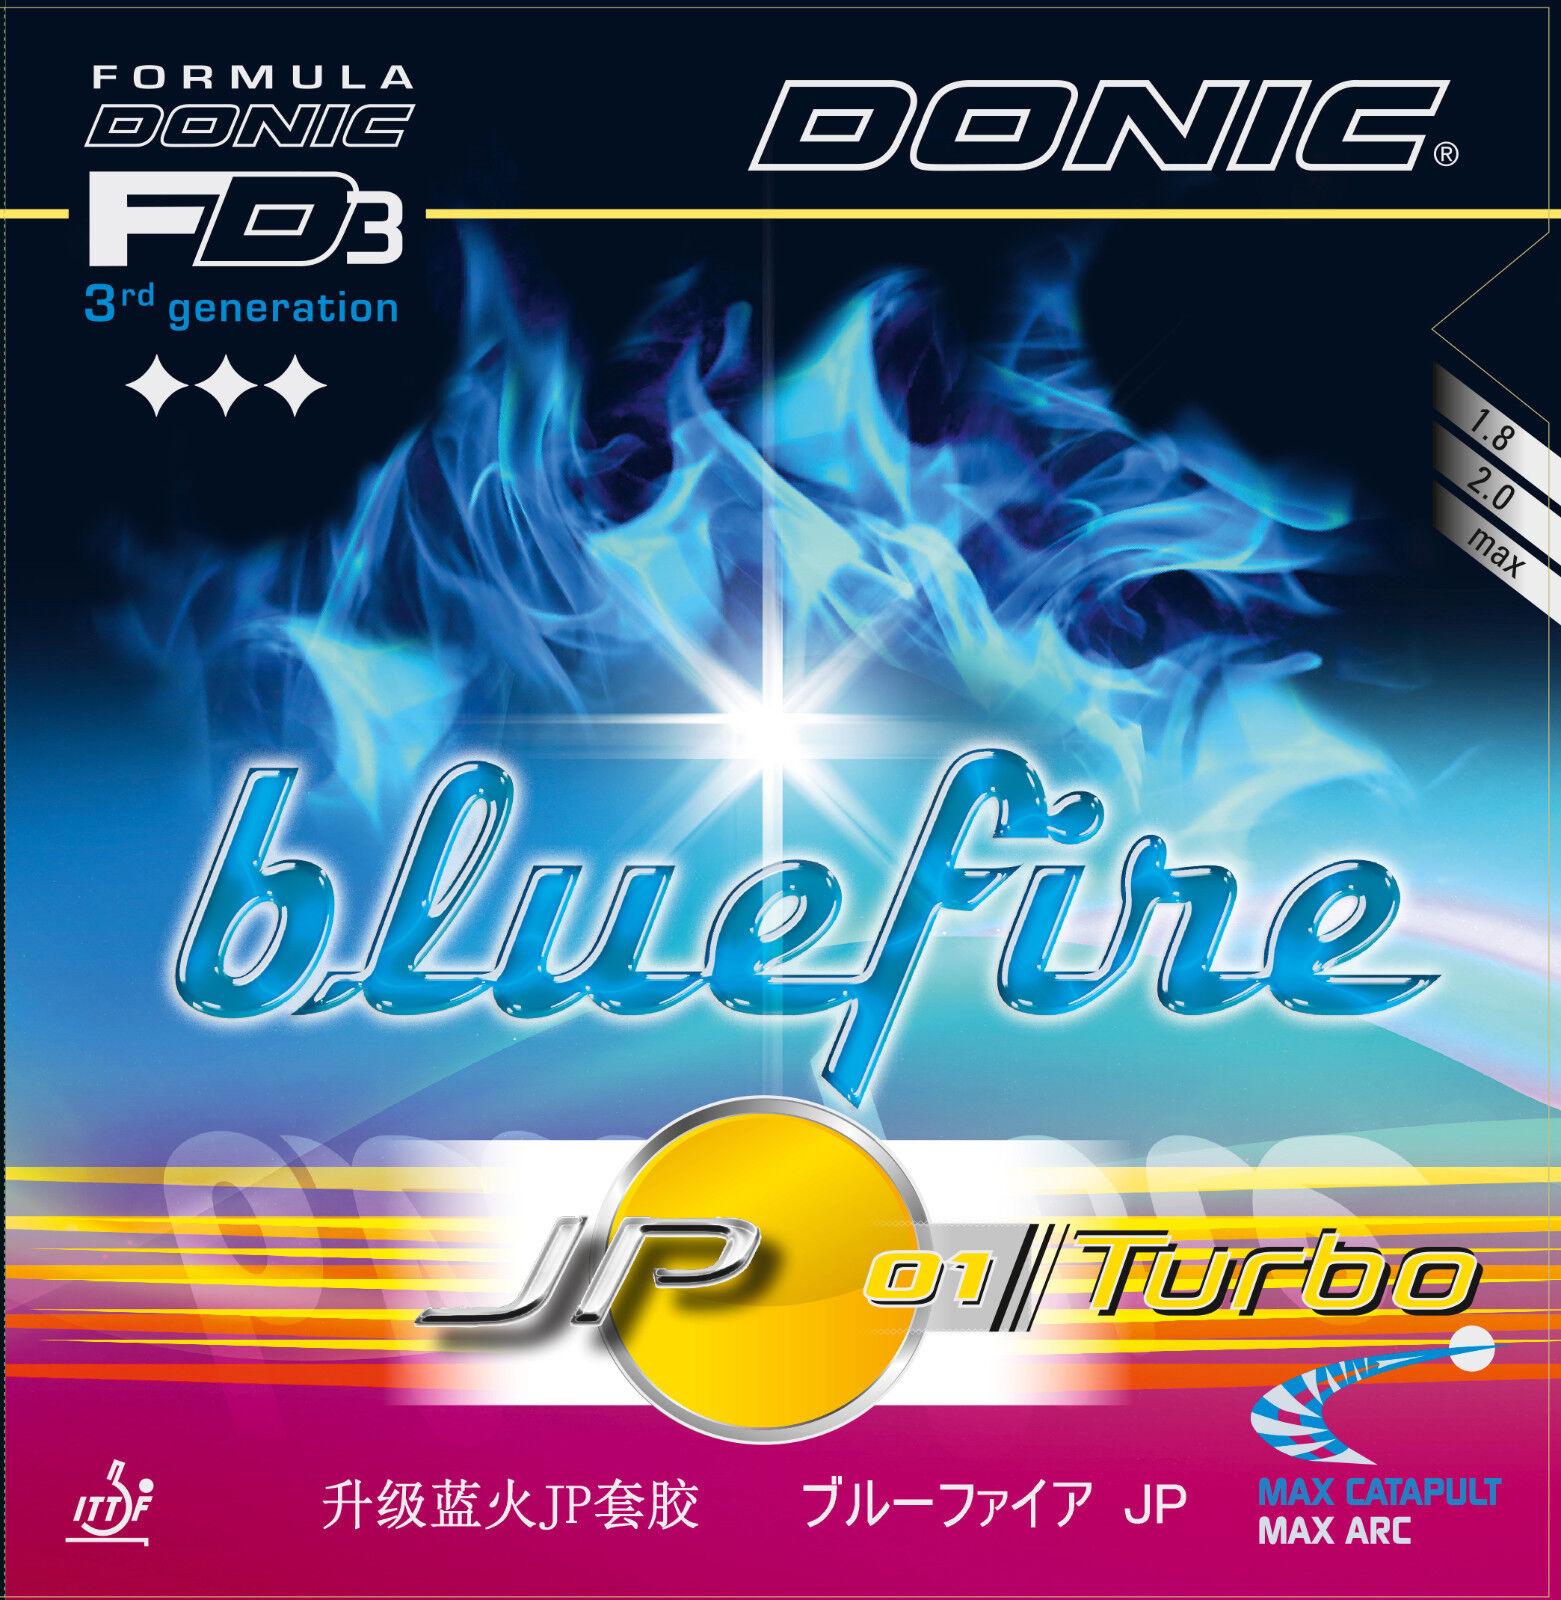 DONIC Blaufire JP01 JP01 JP01 Turbo 2 0mm rot  NEU   OVP fcc241